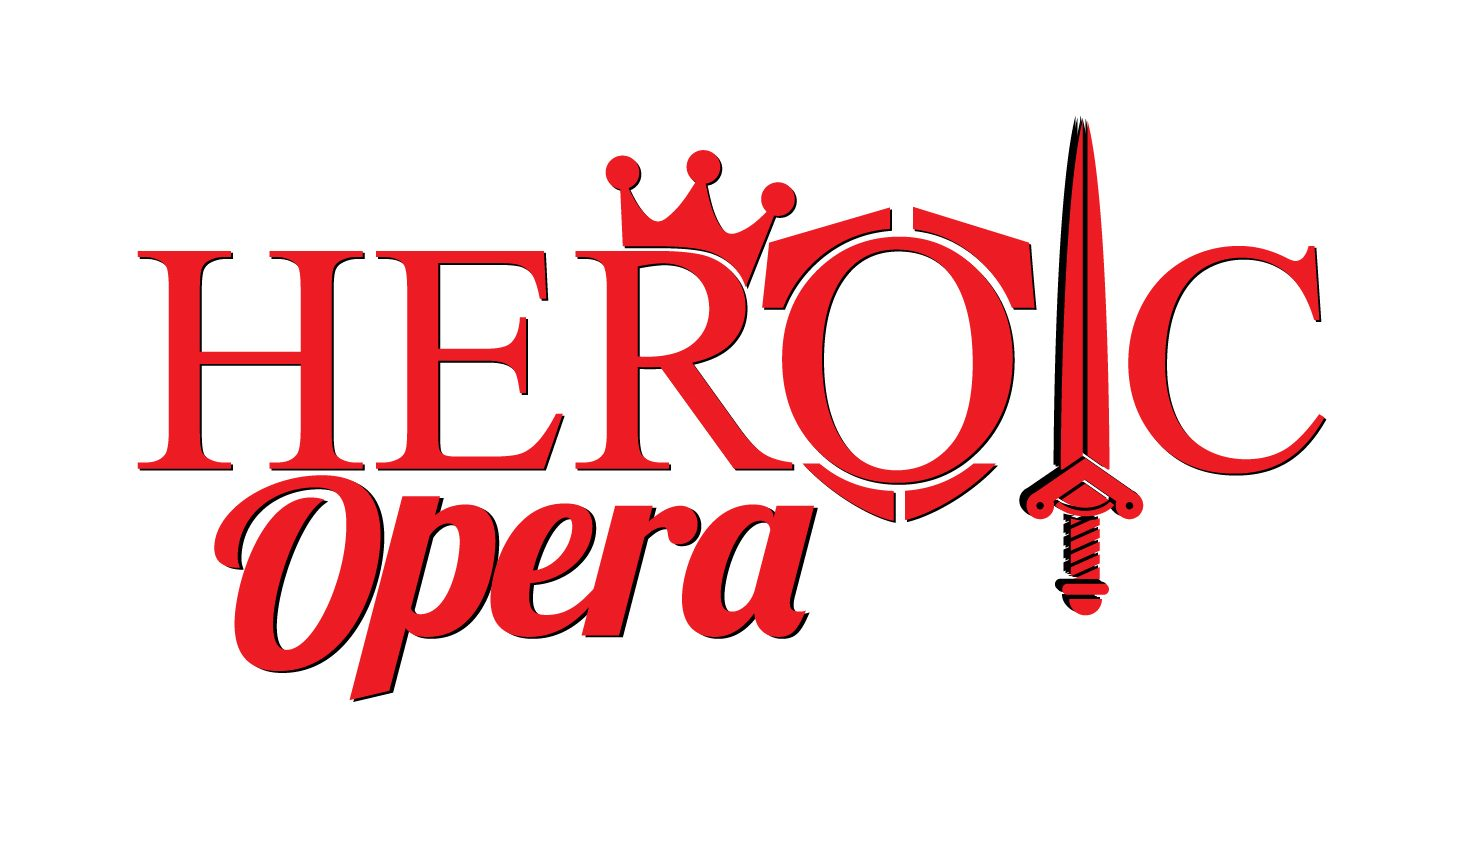 Heroic Opera